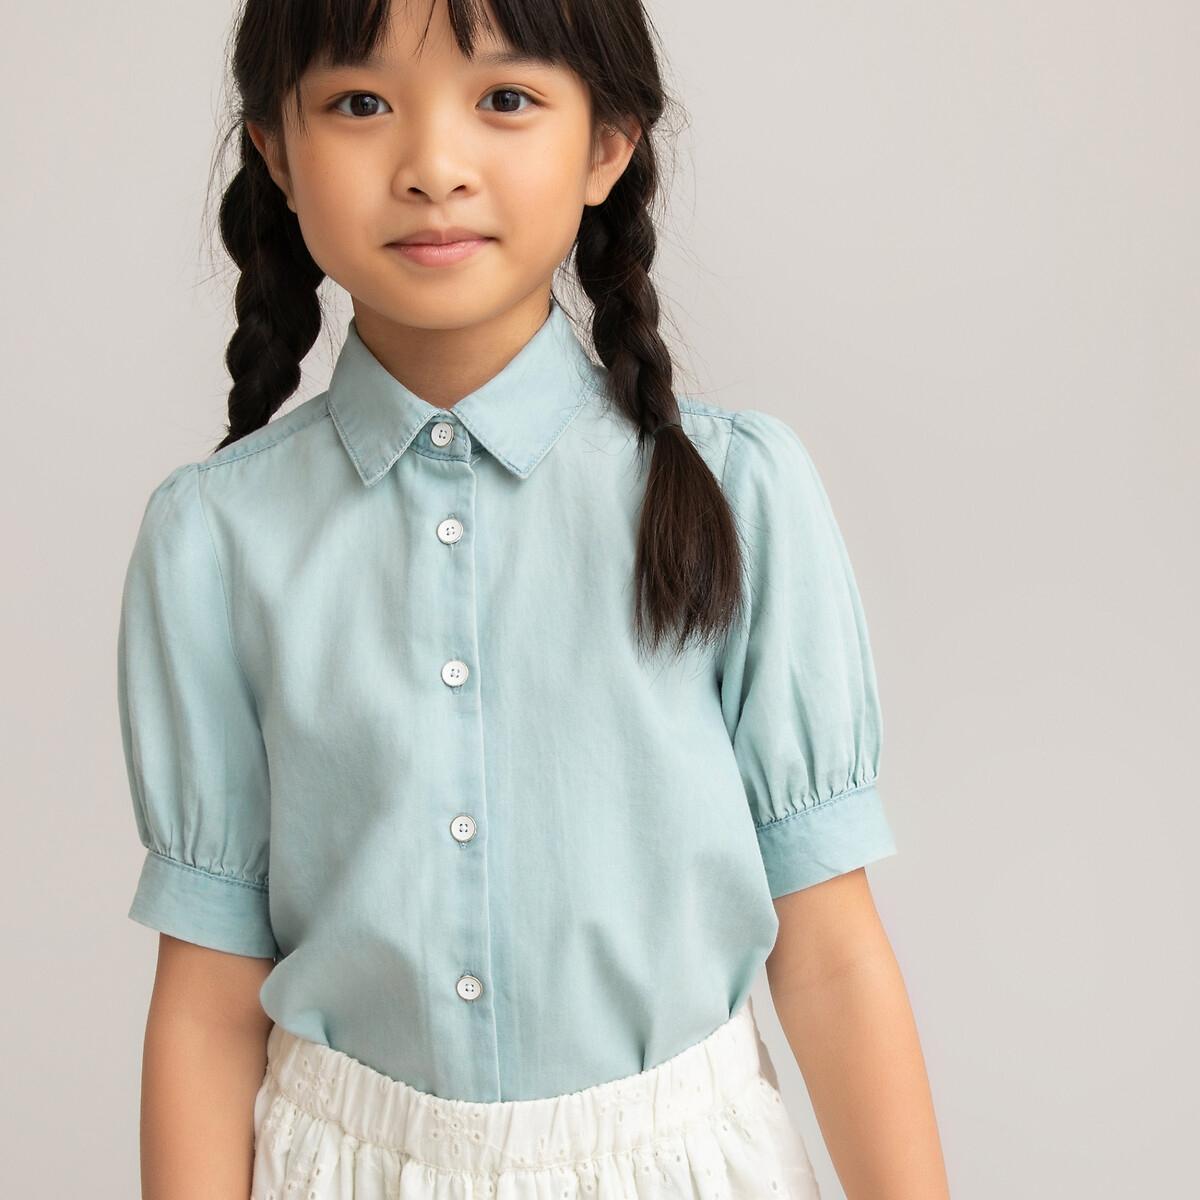 Блузка LaRedoute С короткими рукавами из легкого денима 3-12 лет 4 года - 102 см синий